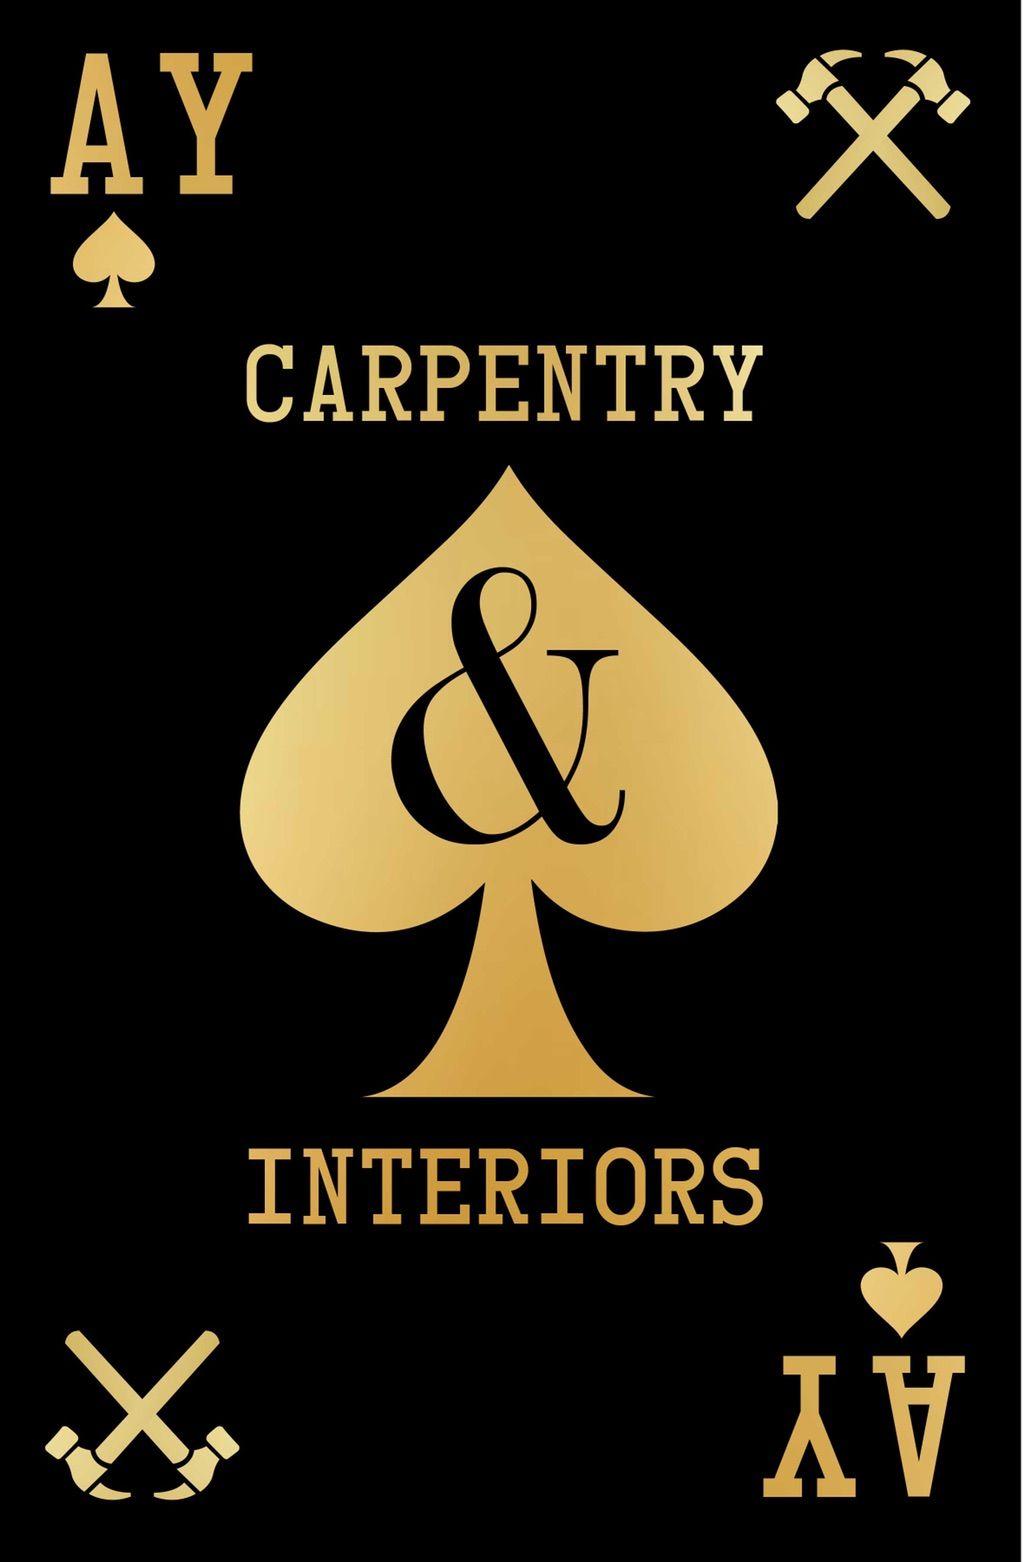 A.Y Carpentry & Interiors LLC